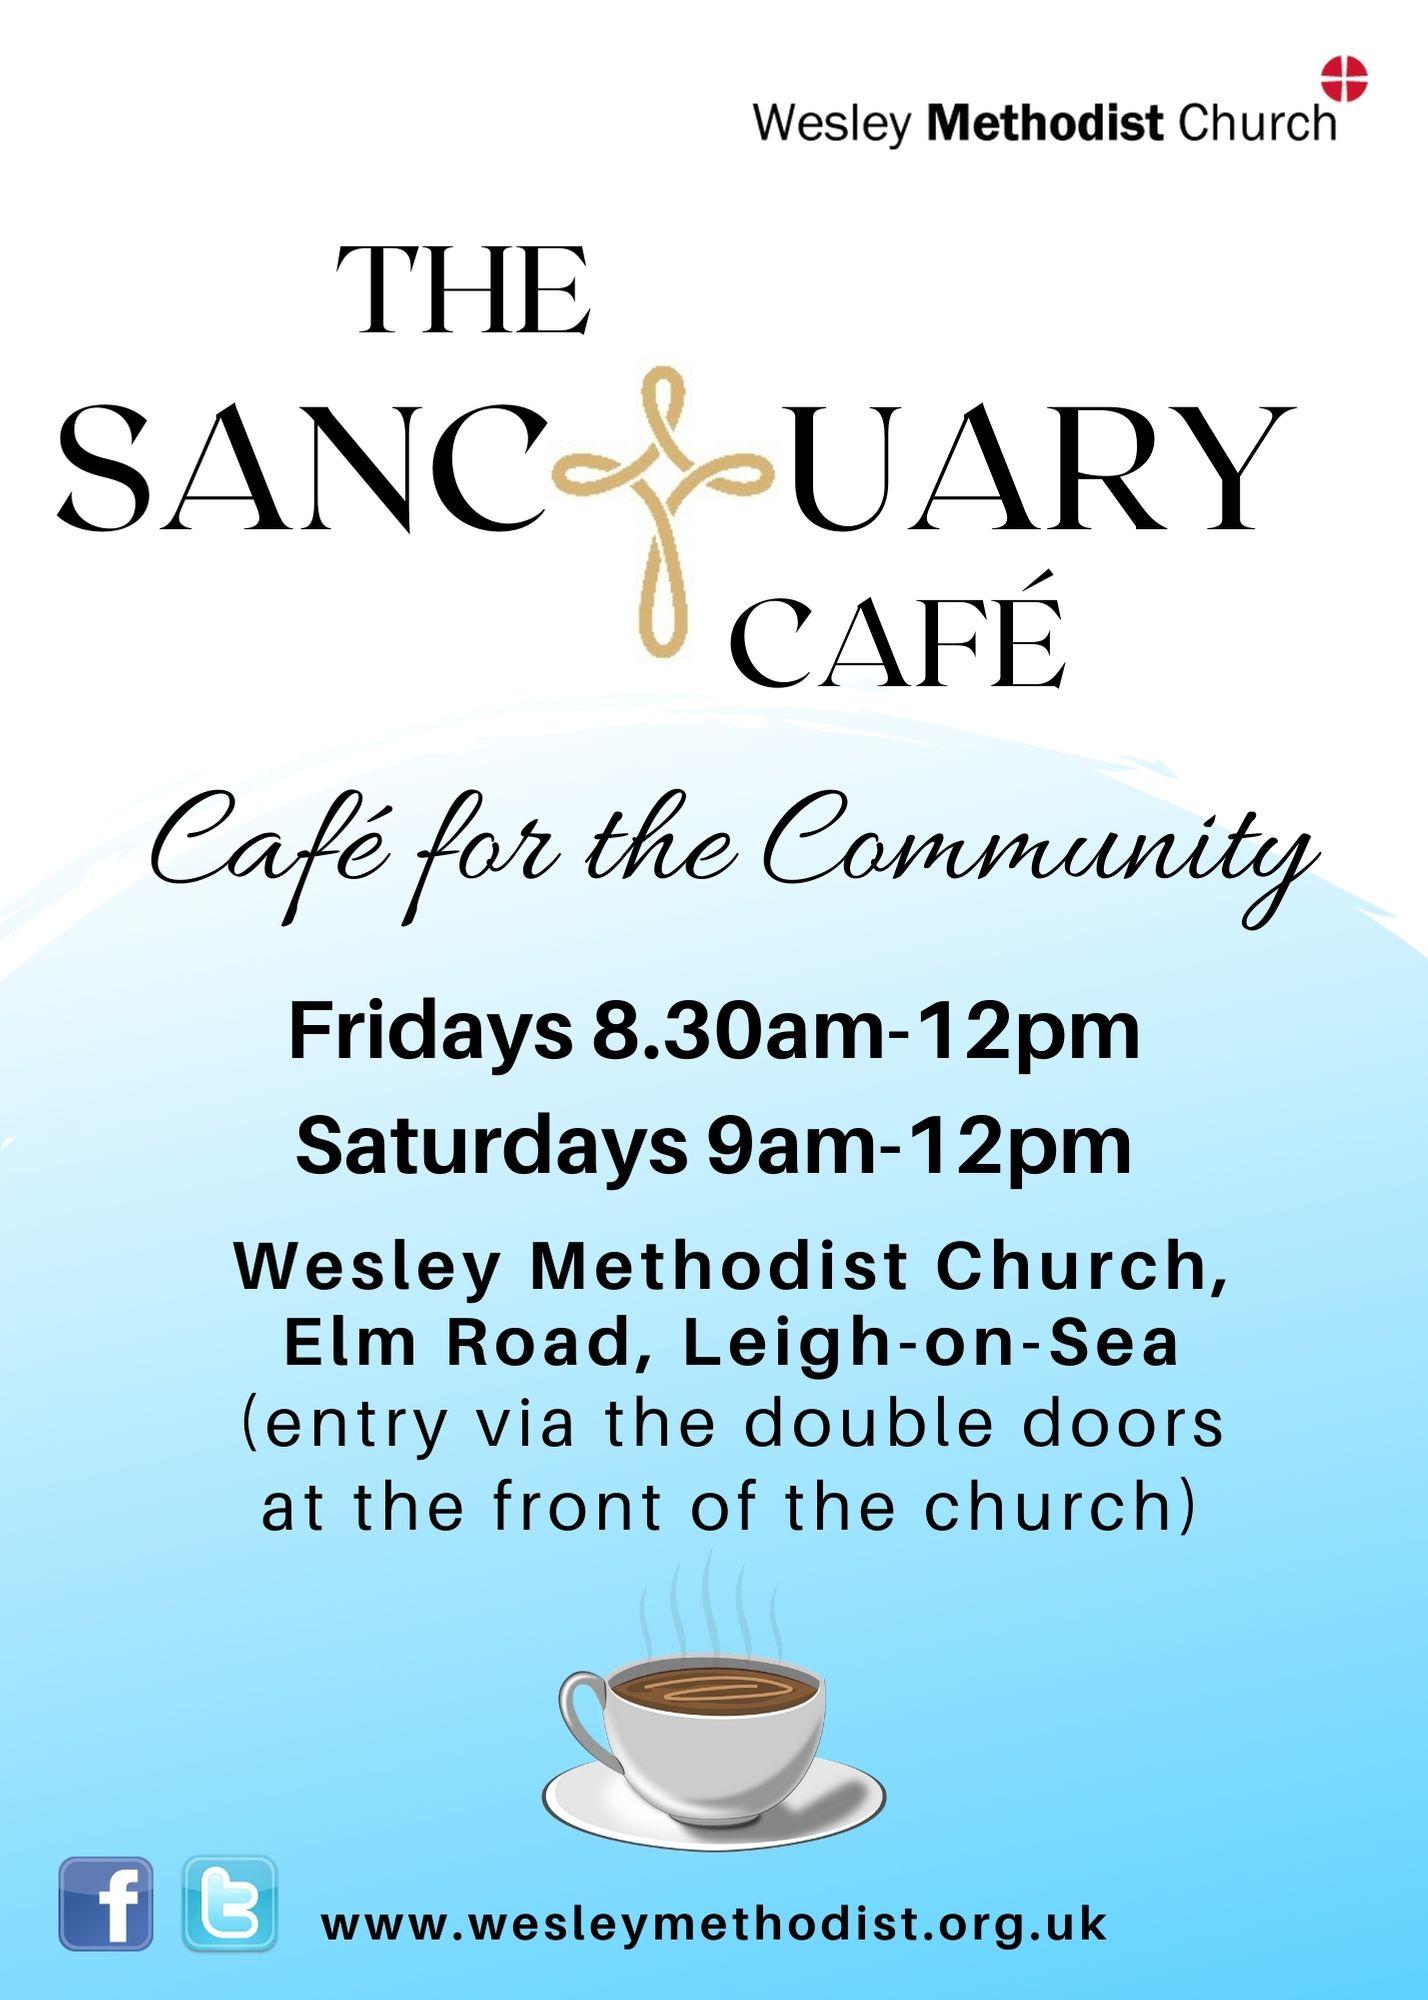 The Sanctuary Cafe